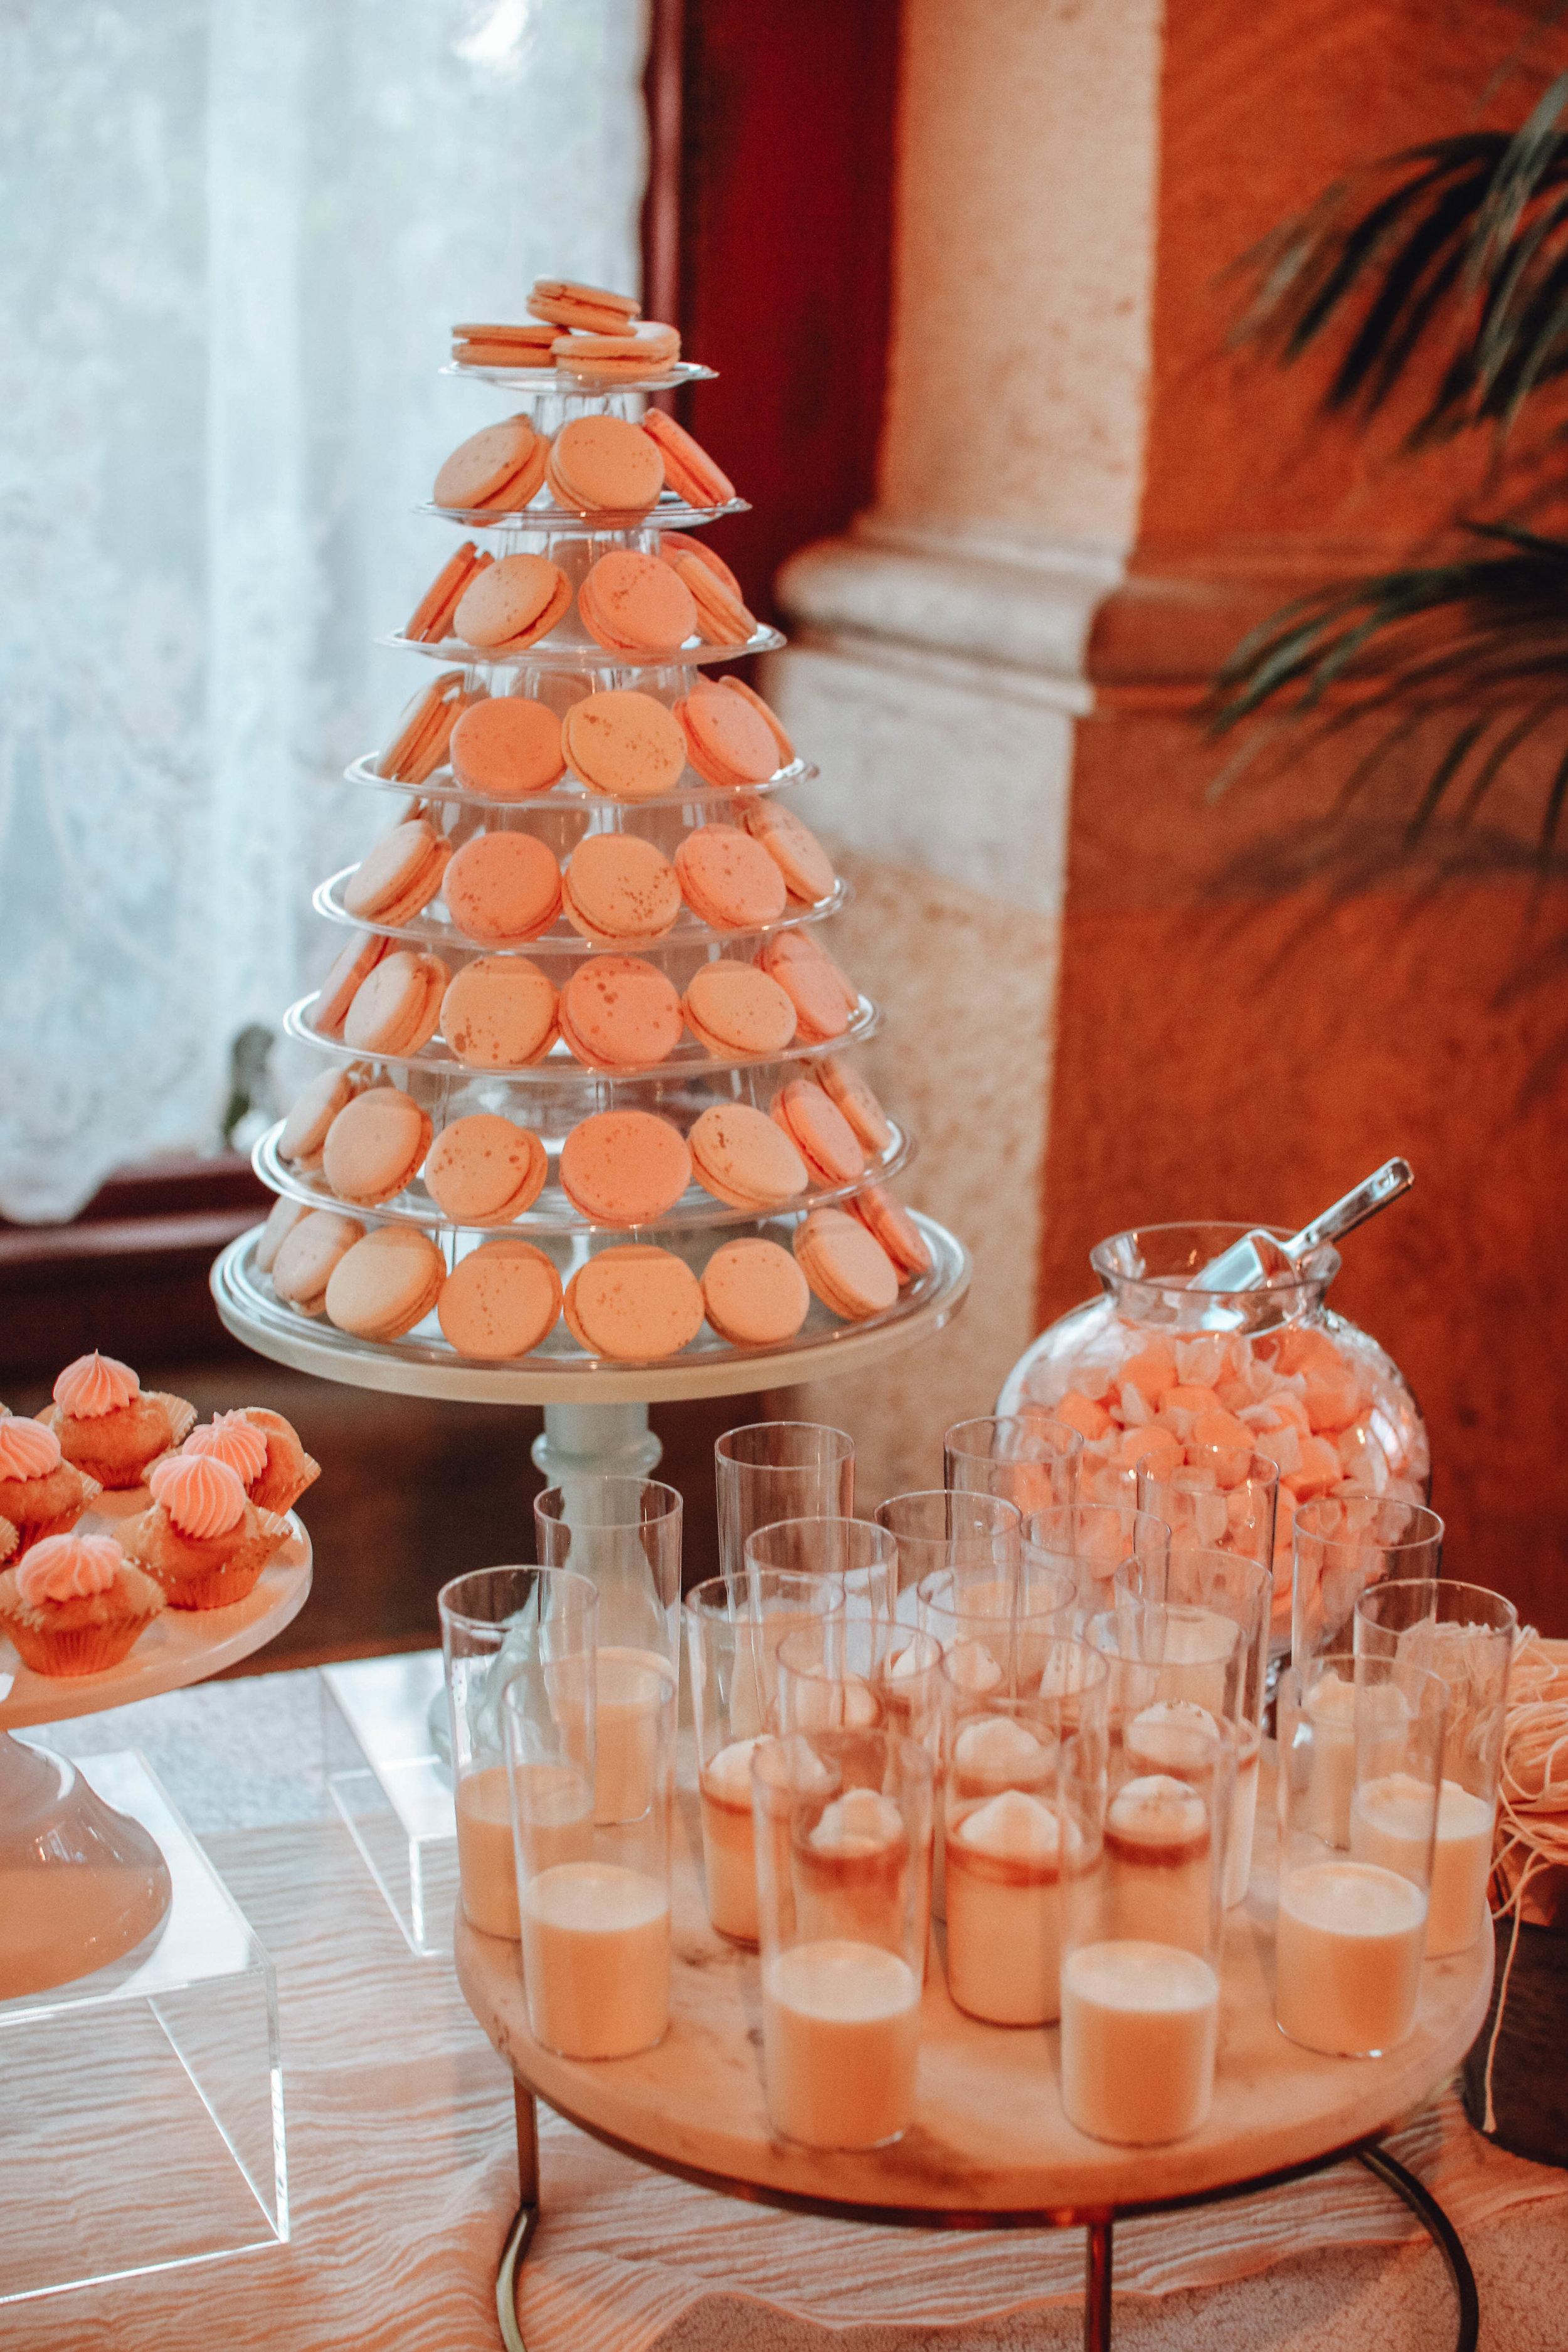 dessert-macaroon.jpg